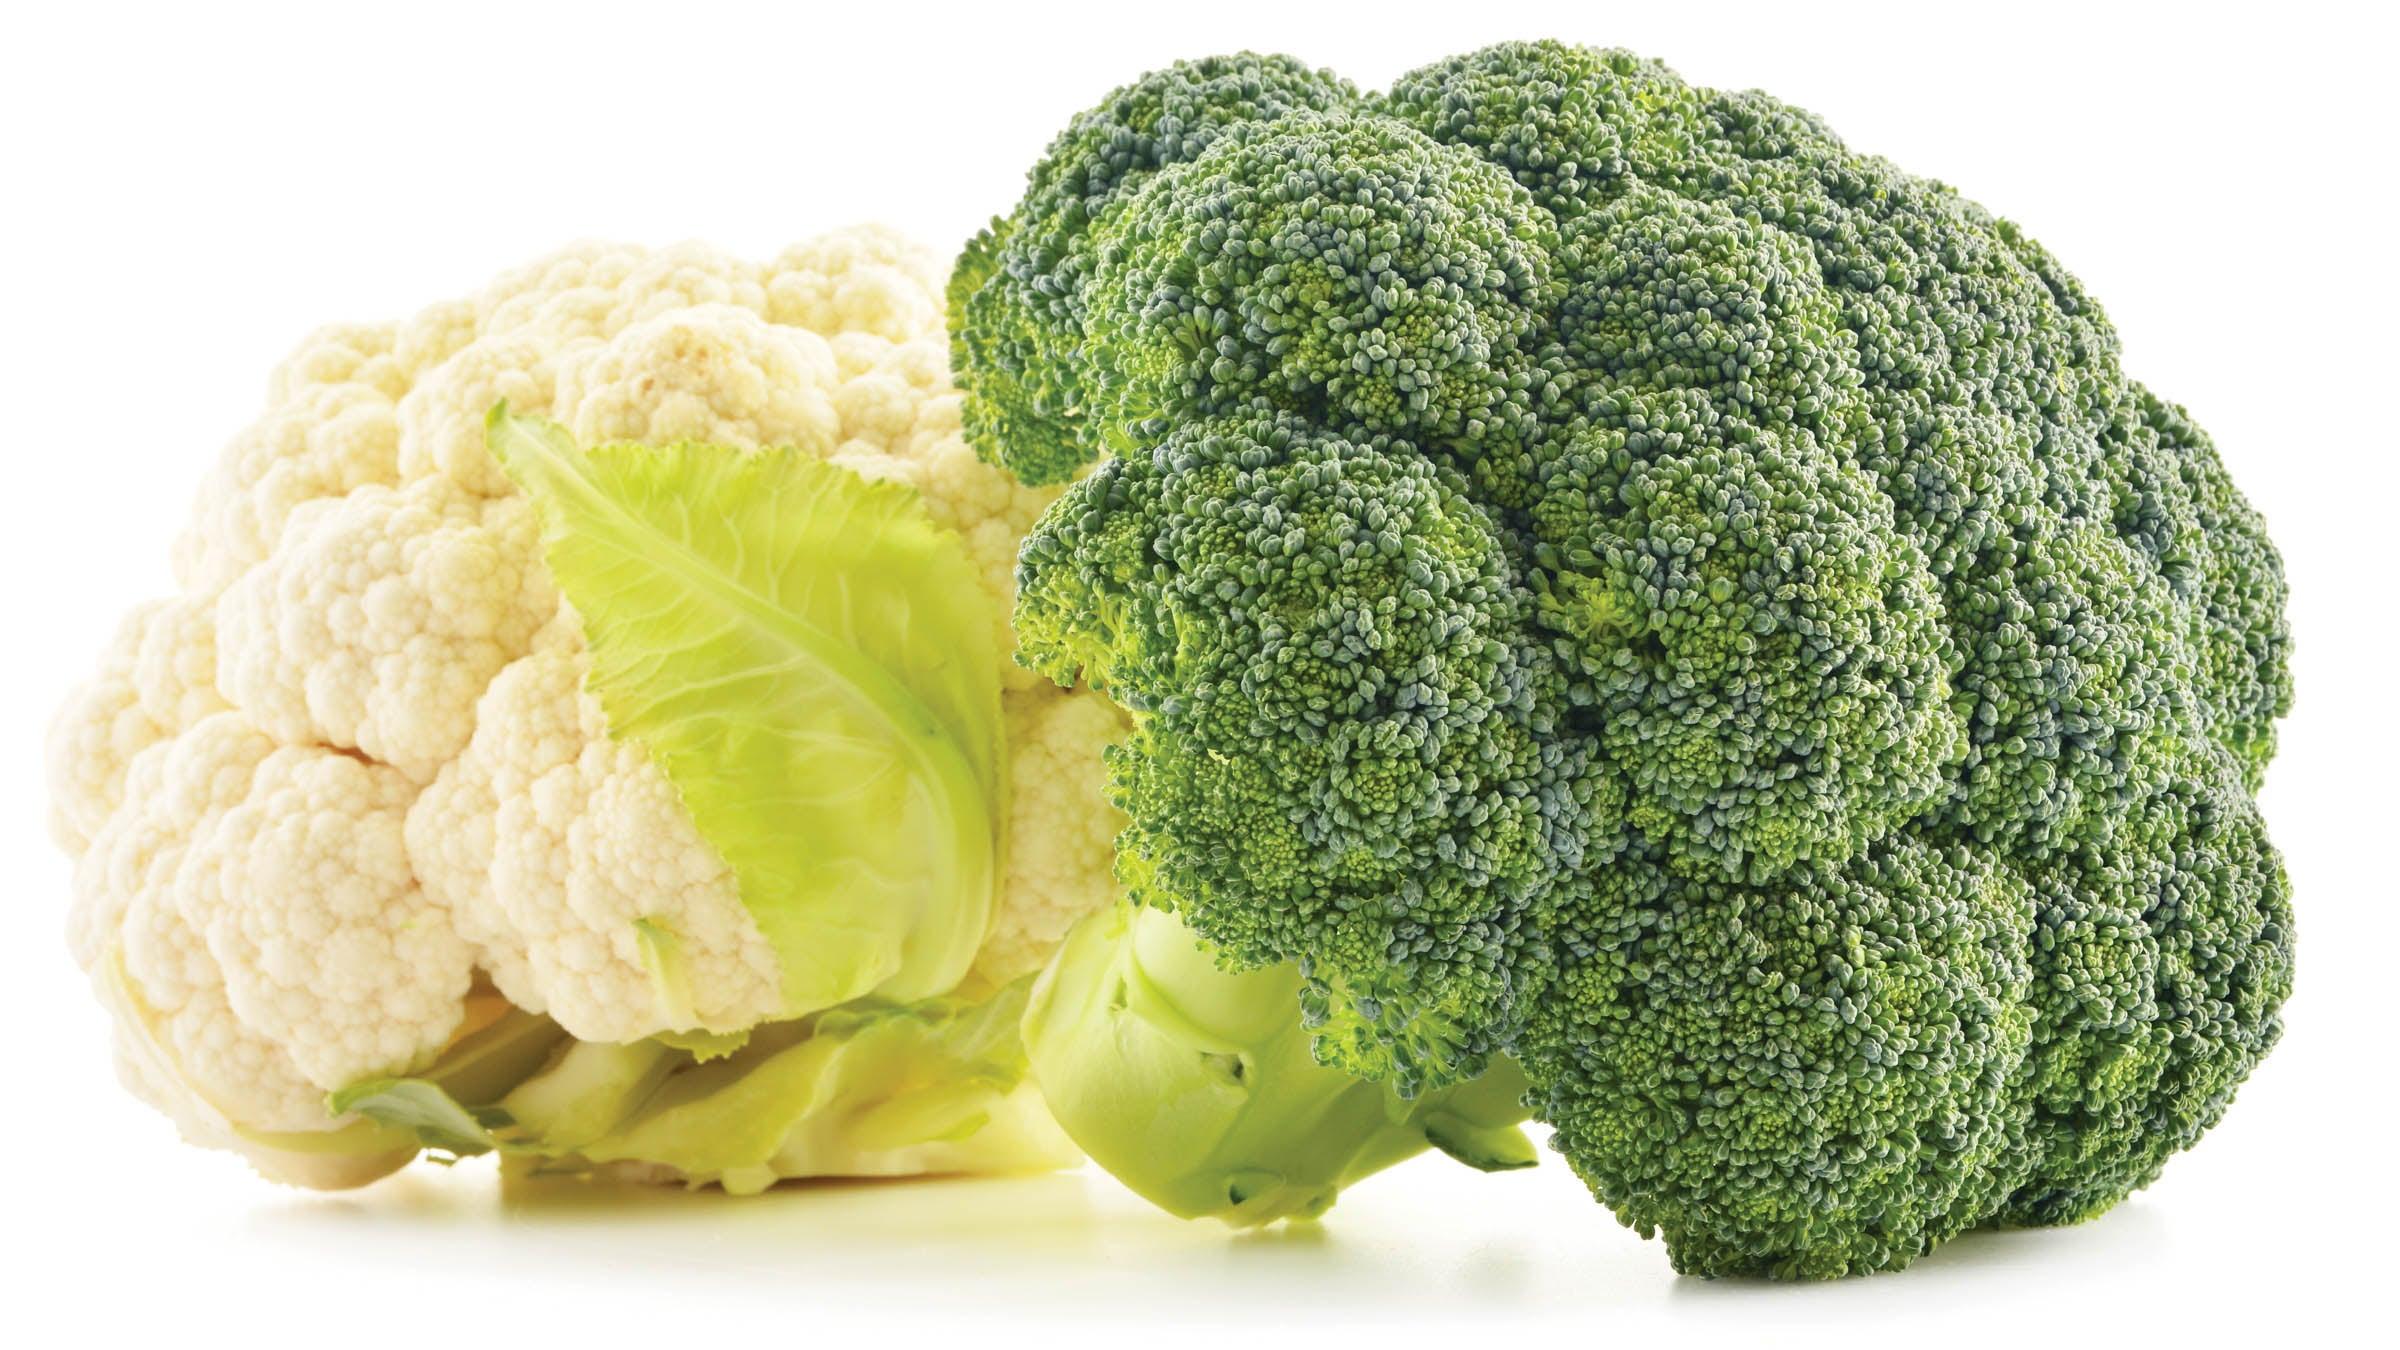 Heads of broccoli and cauliflower